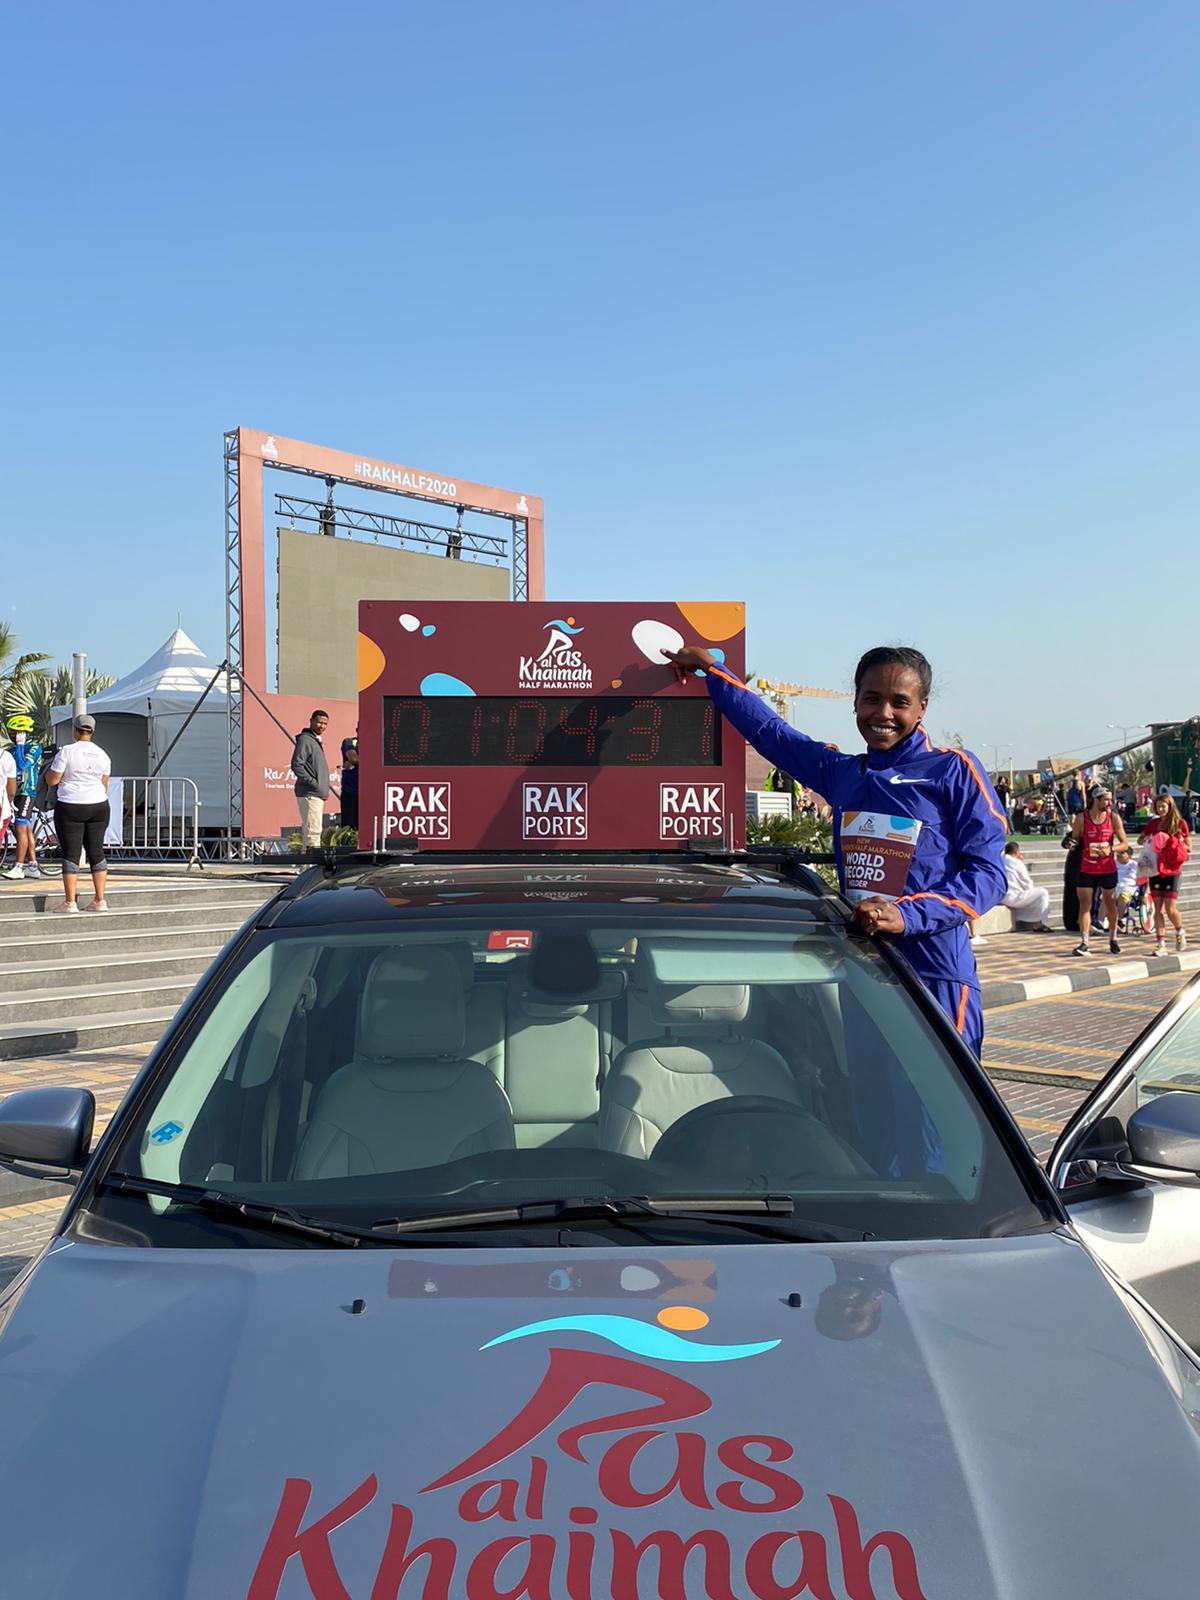 rak-half-marathon-rosa-associati-world-record-ababel-yeshaneh-5